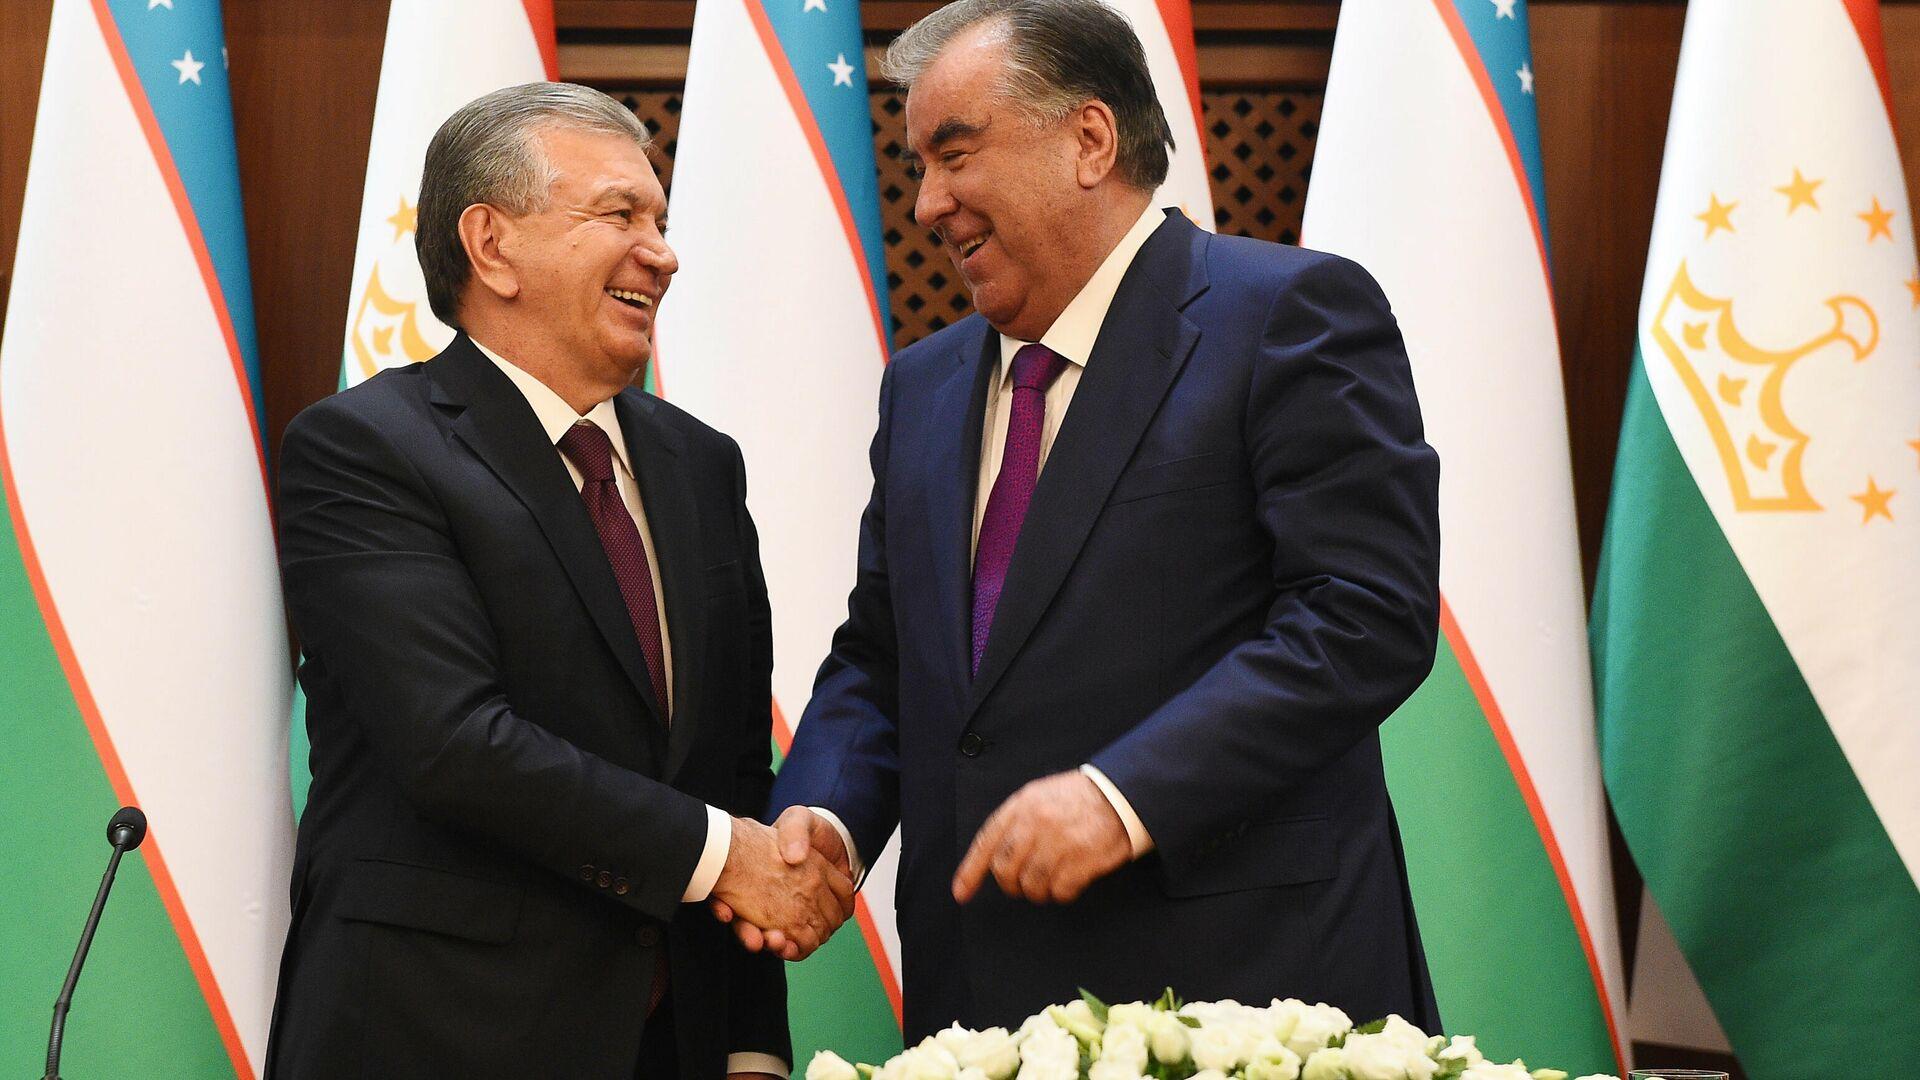 Президент Узбекистана Шавкат Мирзиеев и президент Таджикистана Эмомали Рахмон - Sputnik Таджикистан, 1920, 12.06.2021